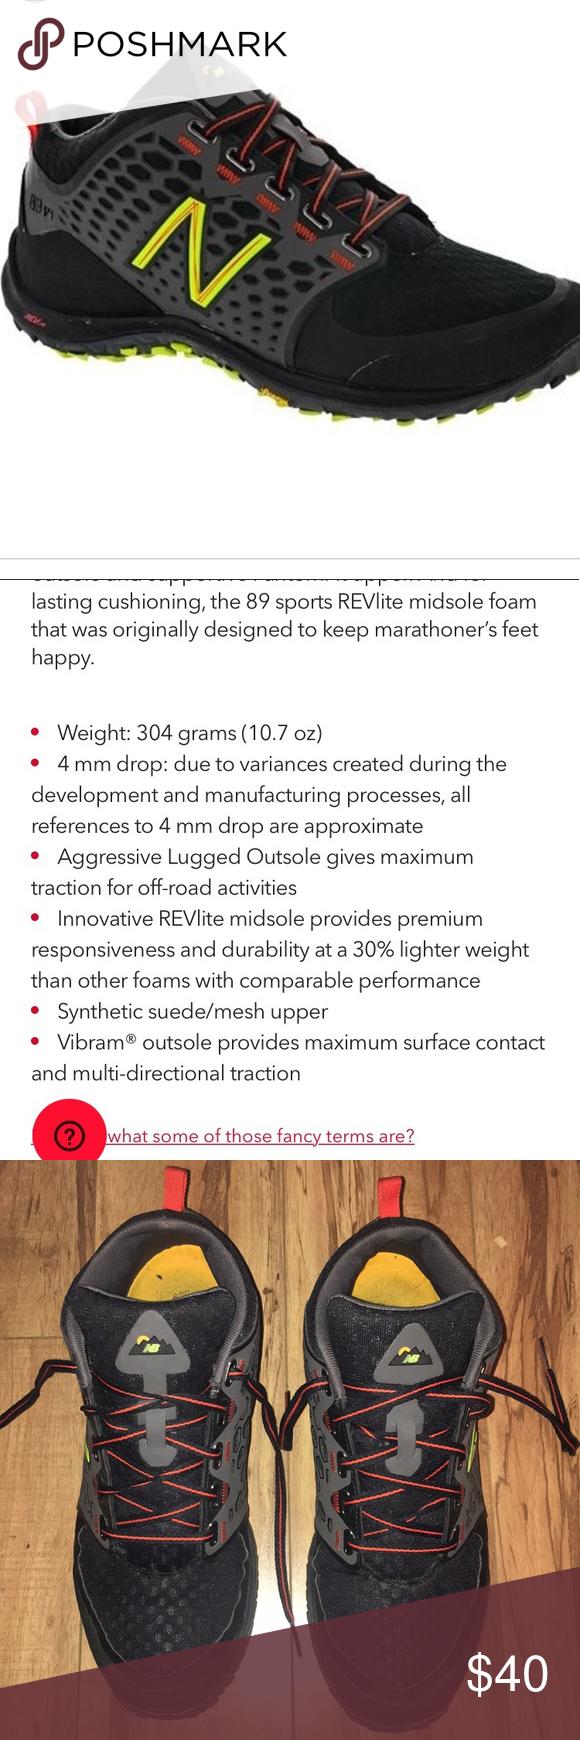 new balance 89 revlite